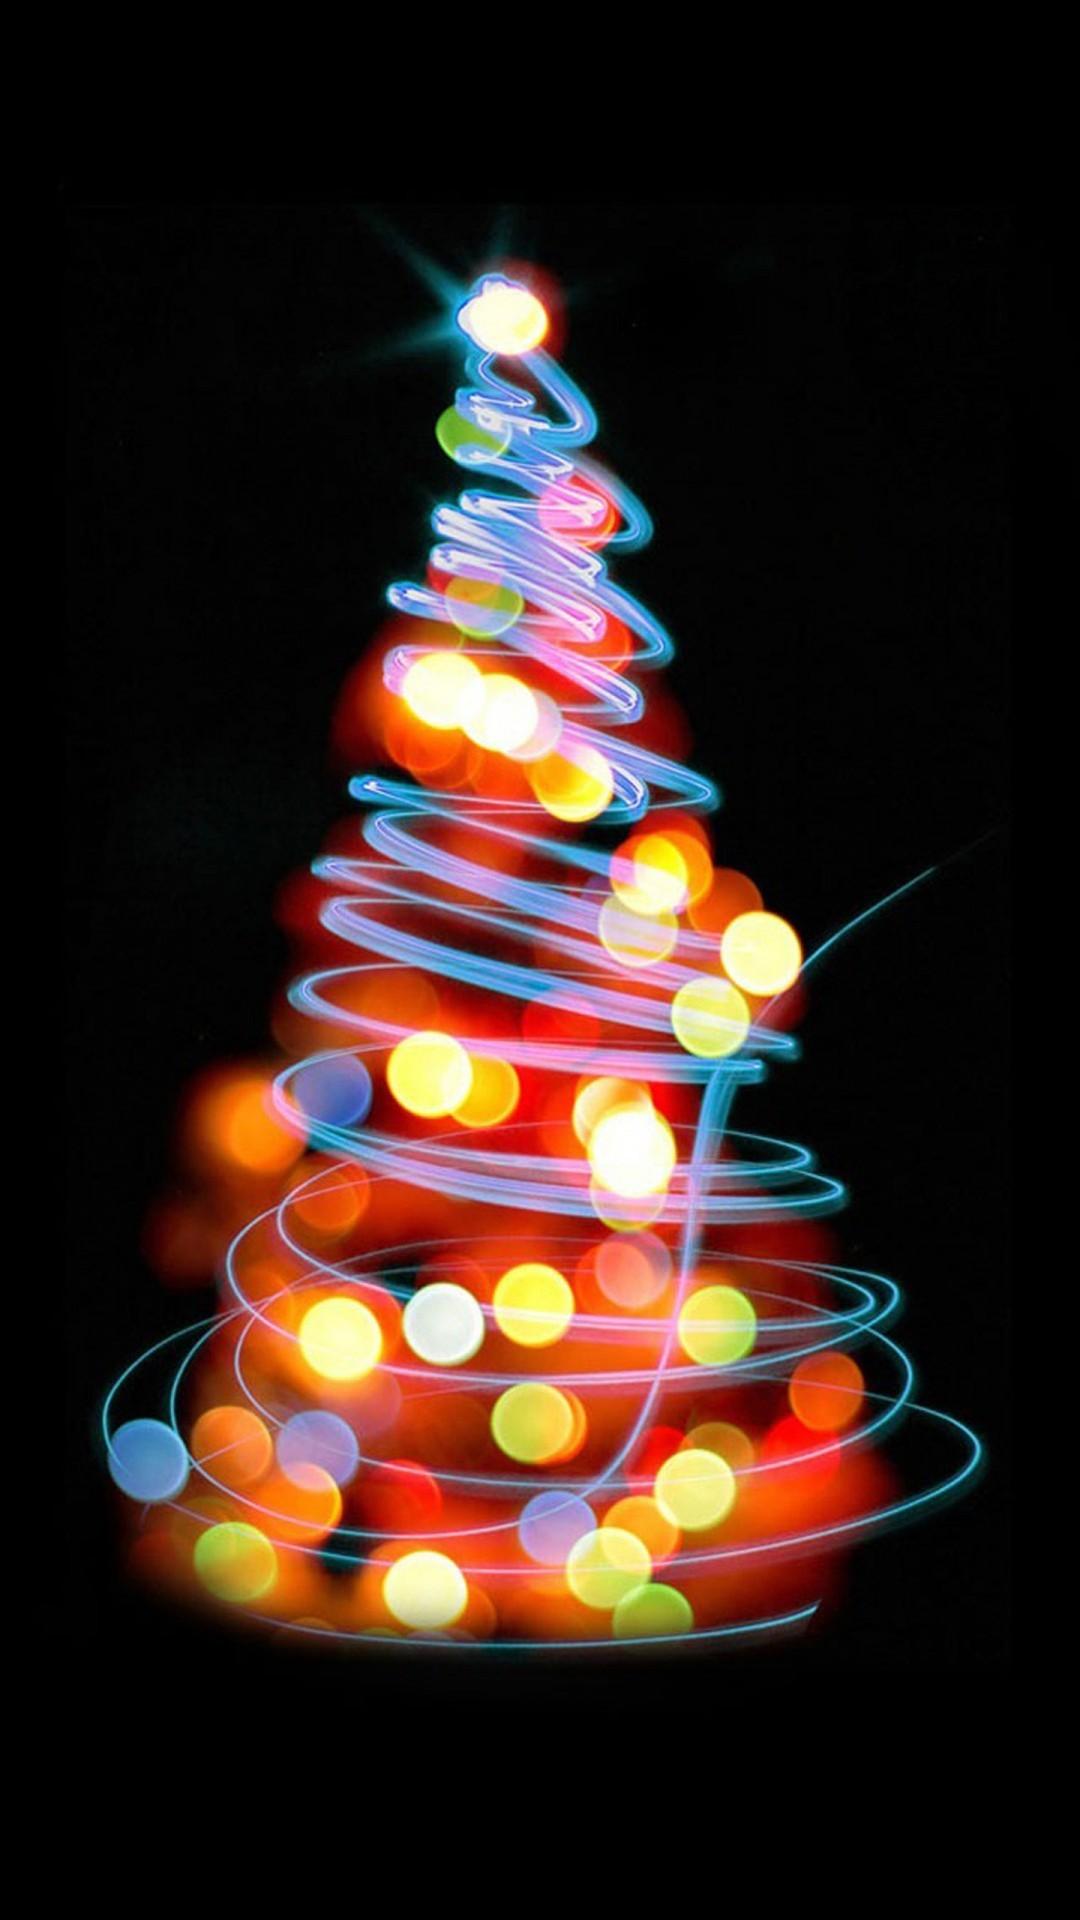 iPhone 6 Plus. Download 0. Christmas Tree Lights